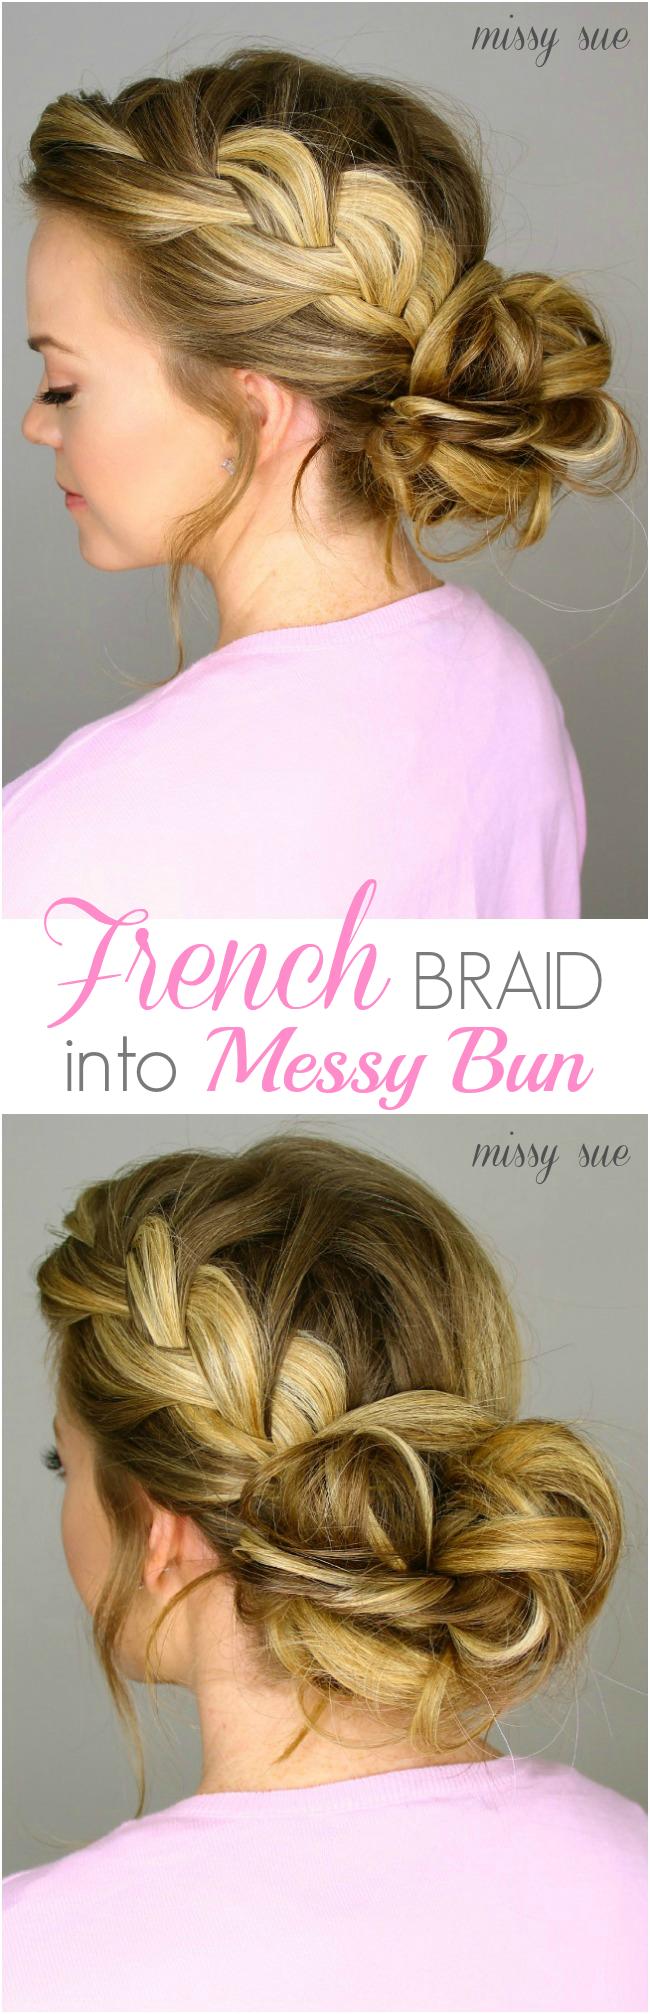 French Braid into Messy Bun | MissySue.com